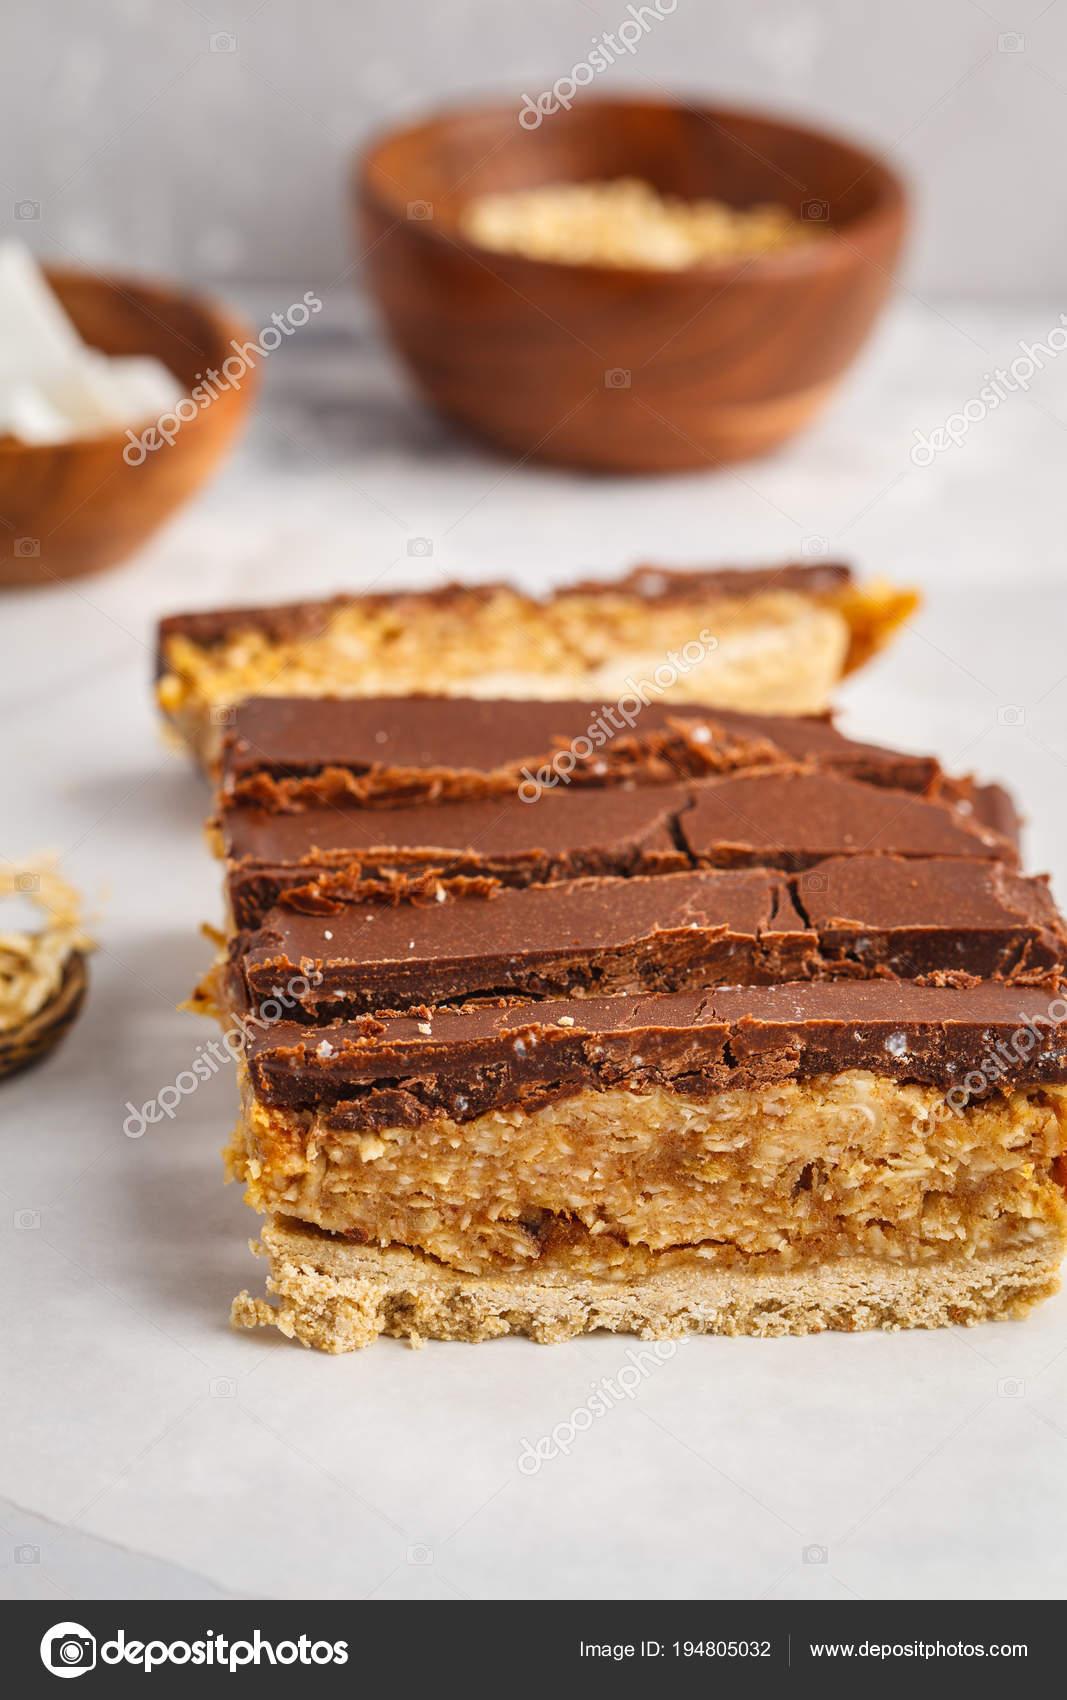 Kokos Oat Roh Vegan Geschnittene Kuchen Mit Schokolade Stockfoto